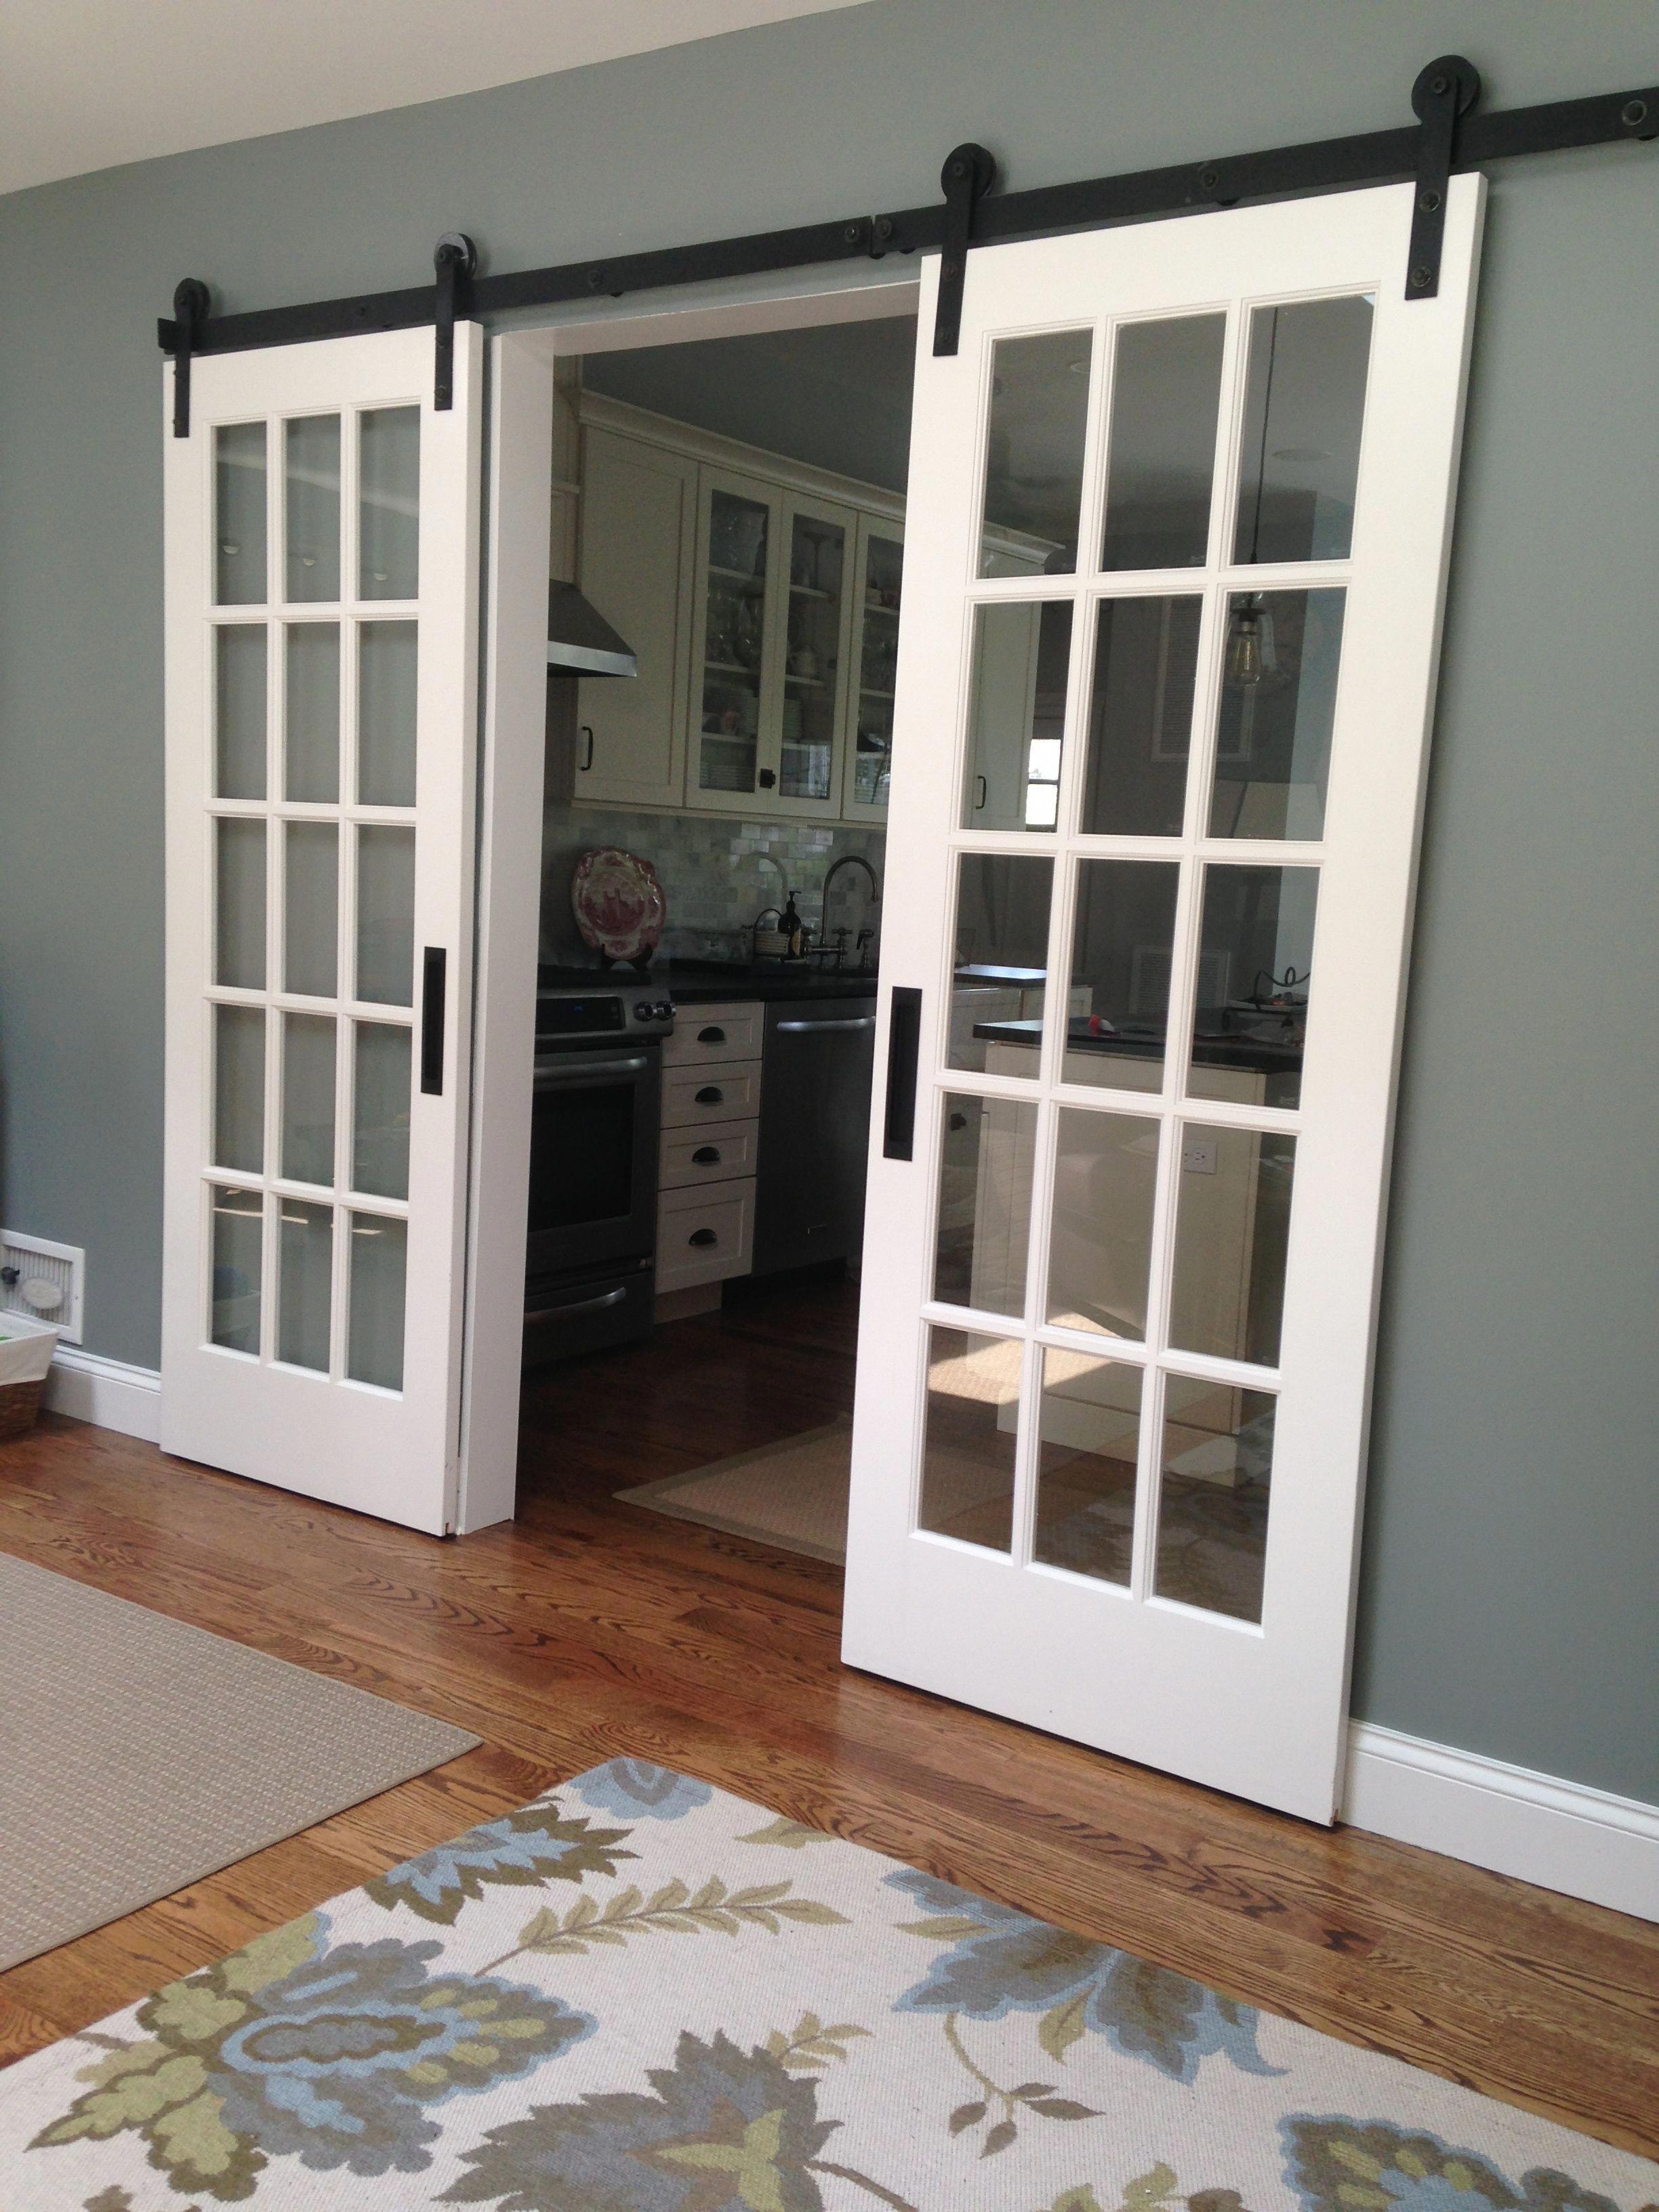 Wood Closet Doors Sliding Doors Inside House Sliding Door Sizes Interior 20181203 French Doors Interior Sliding French Doors Glass Barn Doors